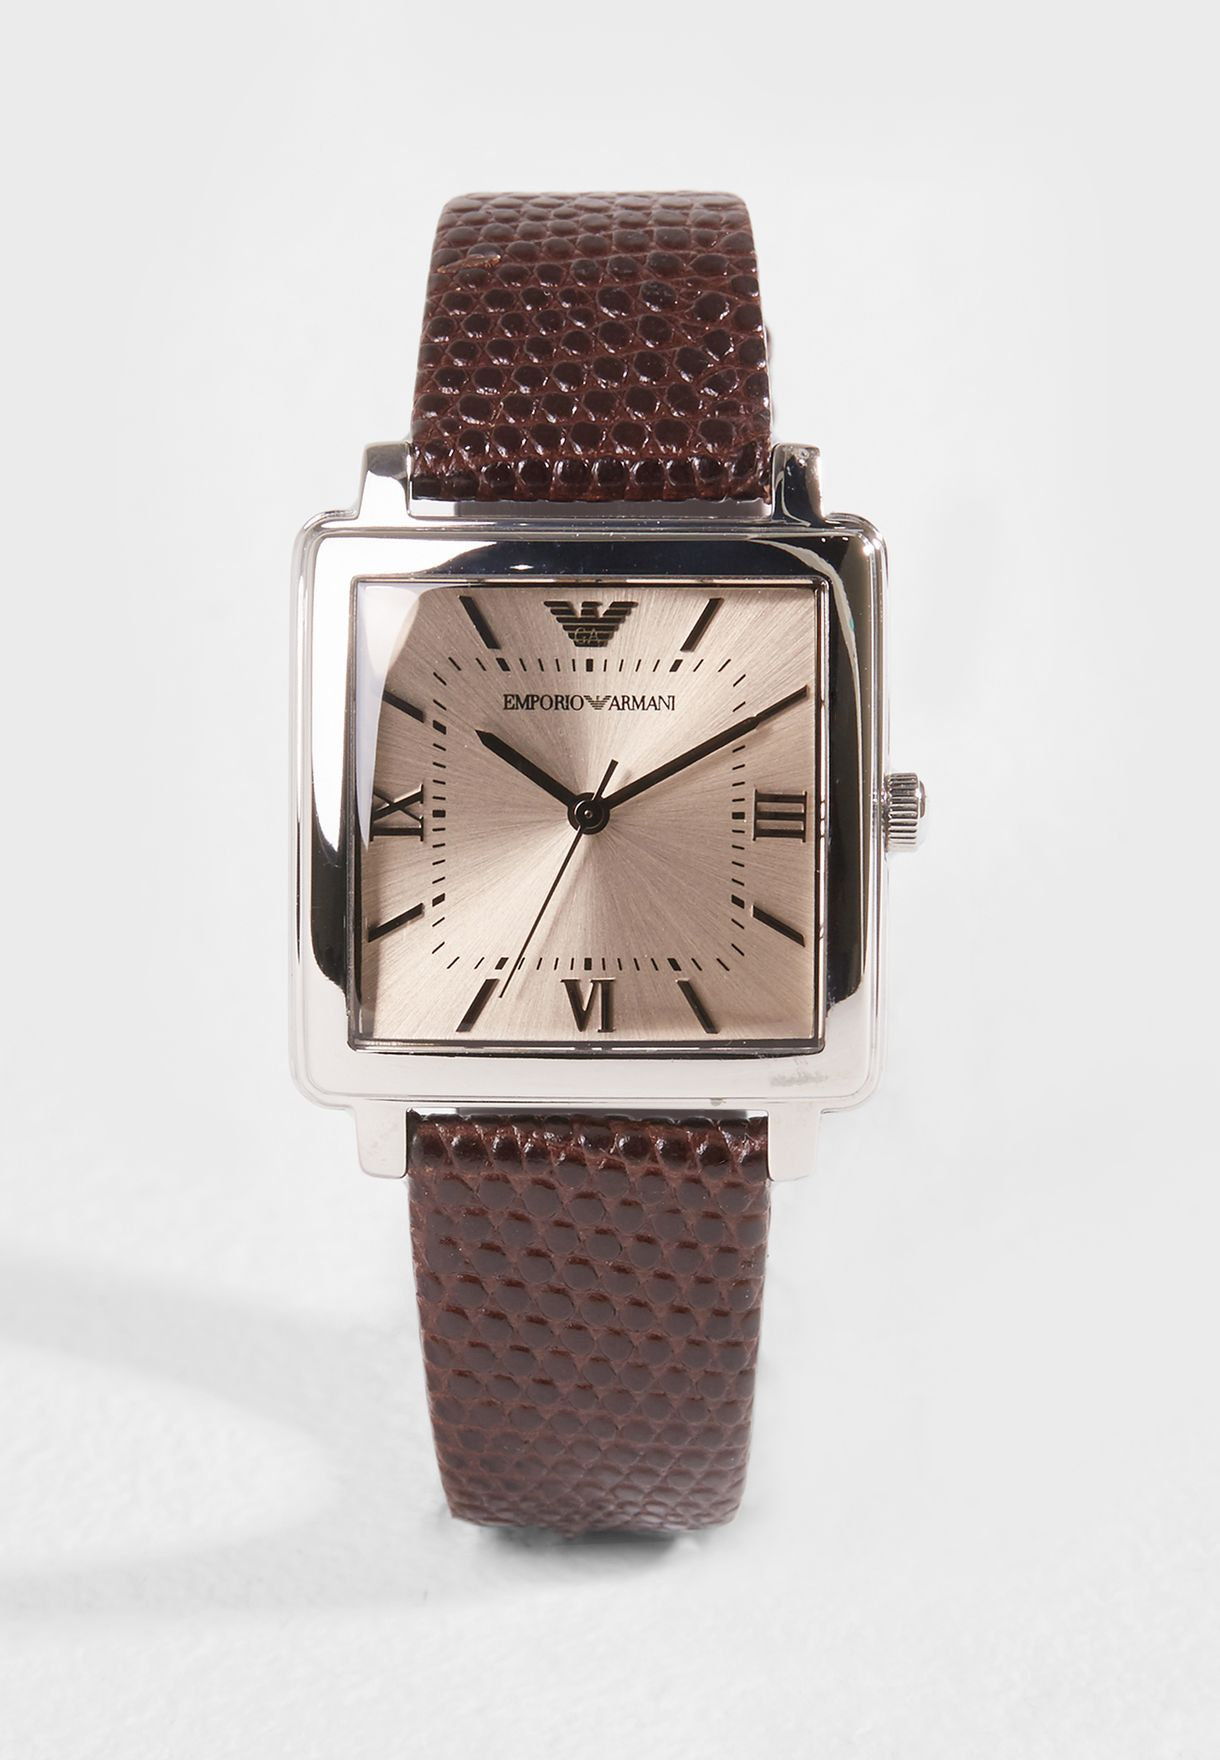 730ffa35e تسوق ساعة مربعة عصرية ماركة امبريو ارماني لون أسود AR11099 في ...